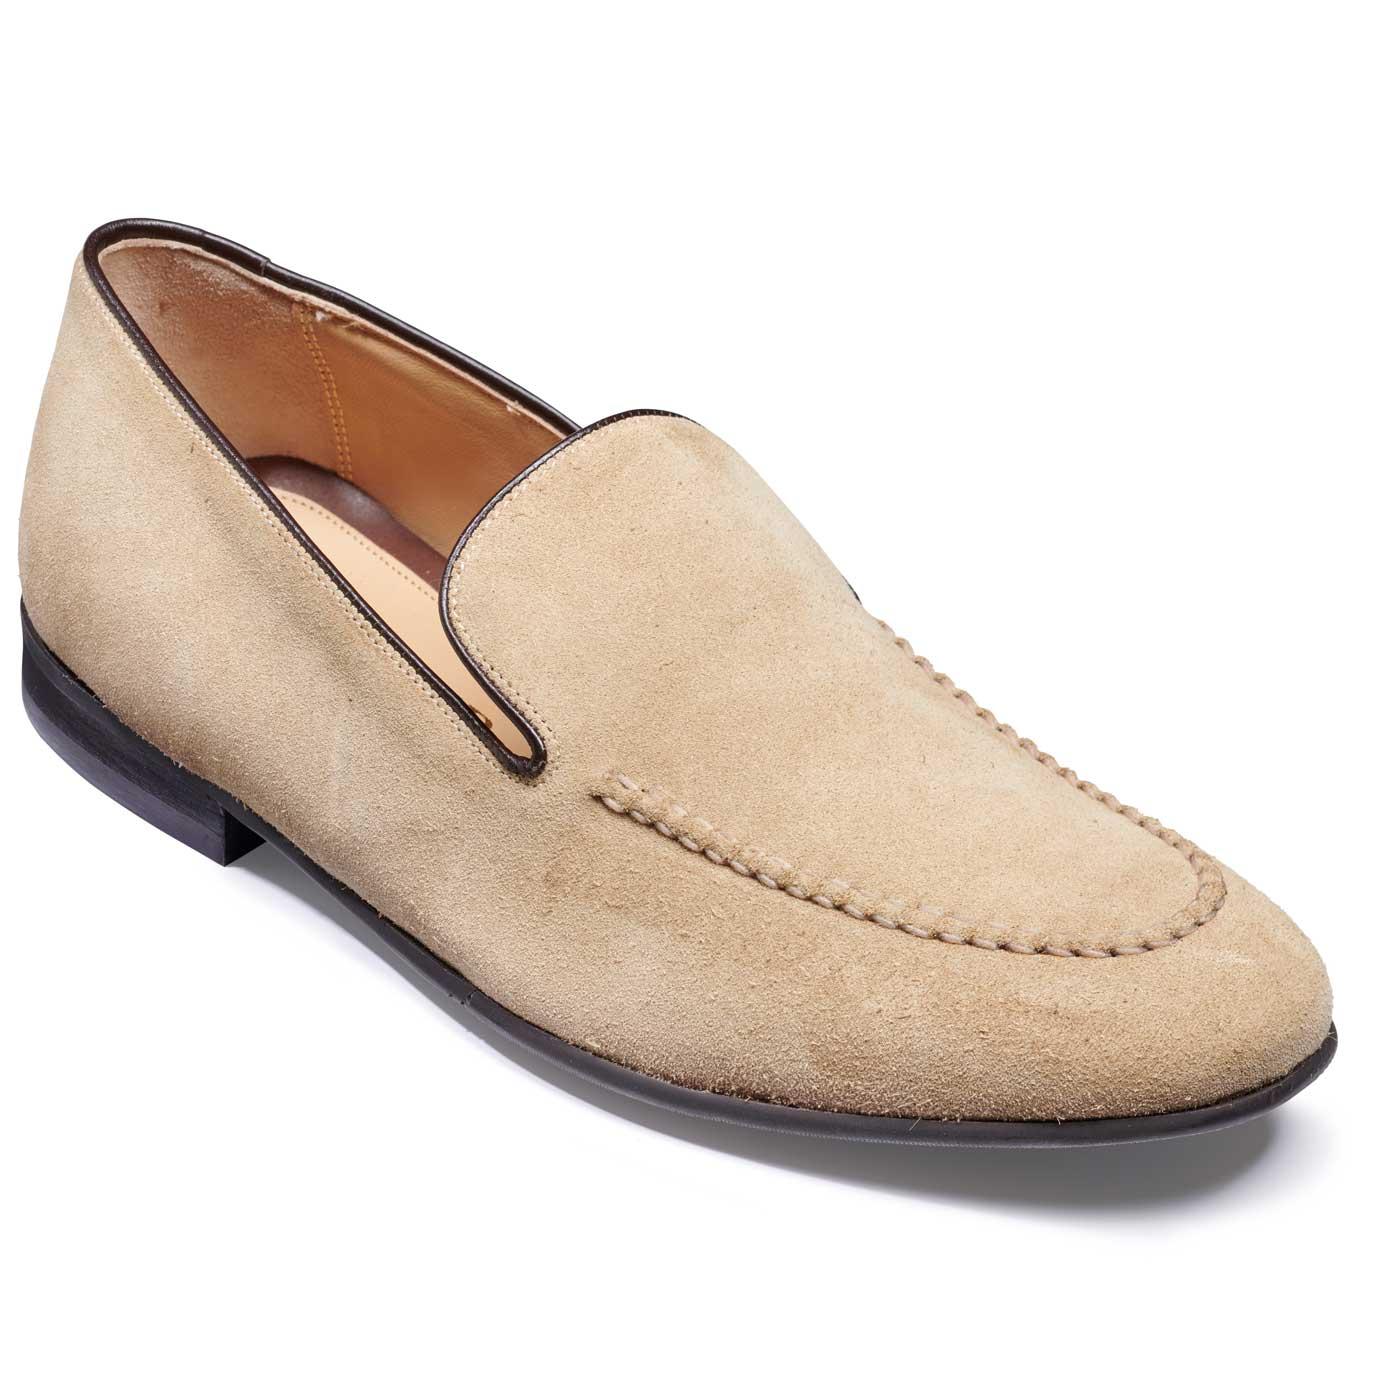 BARKER Swanage Shoes - Mens Slip On